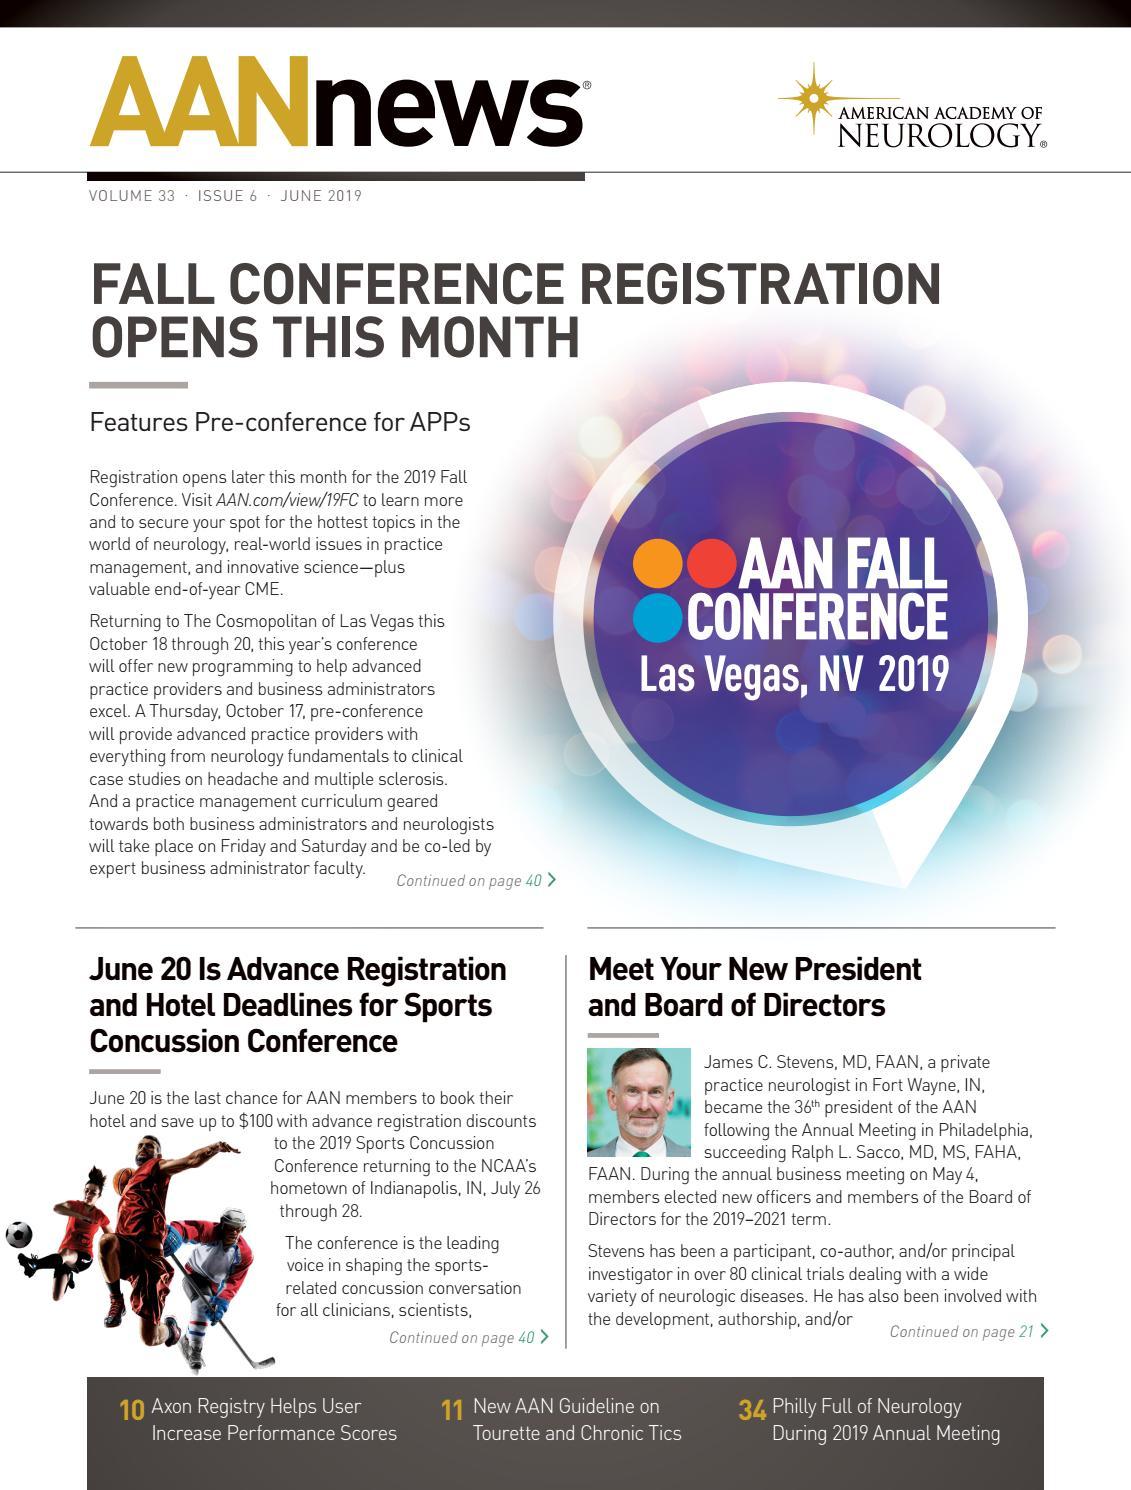 2019 June AANnews by American Academy of Neurology - issuu